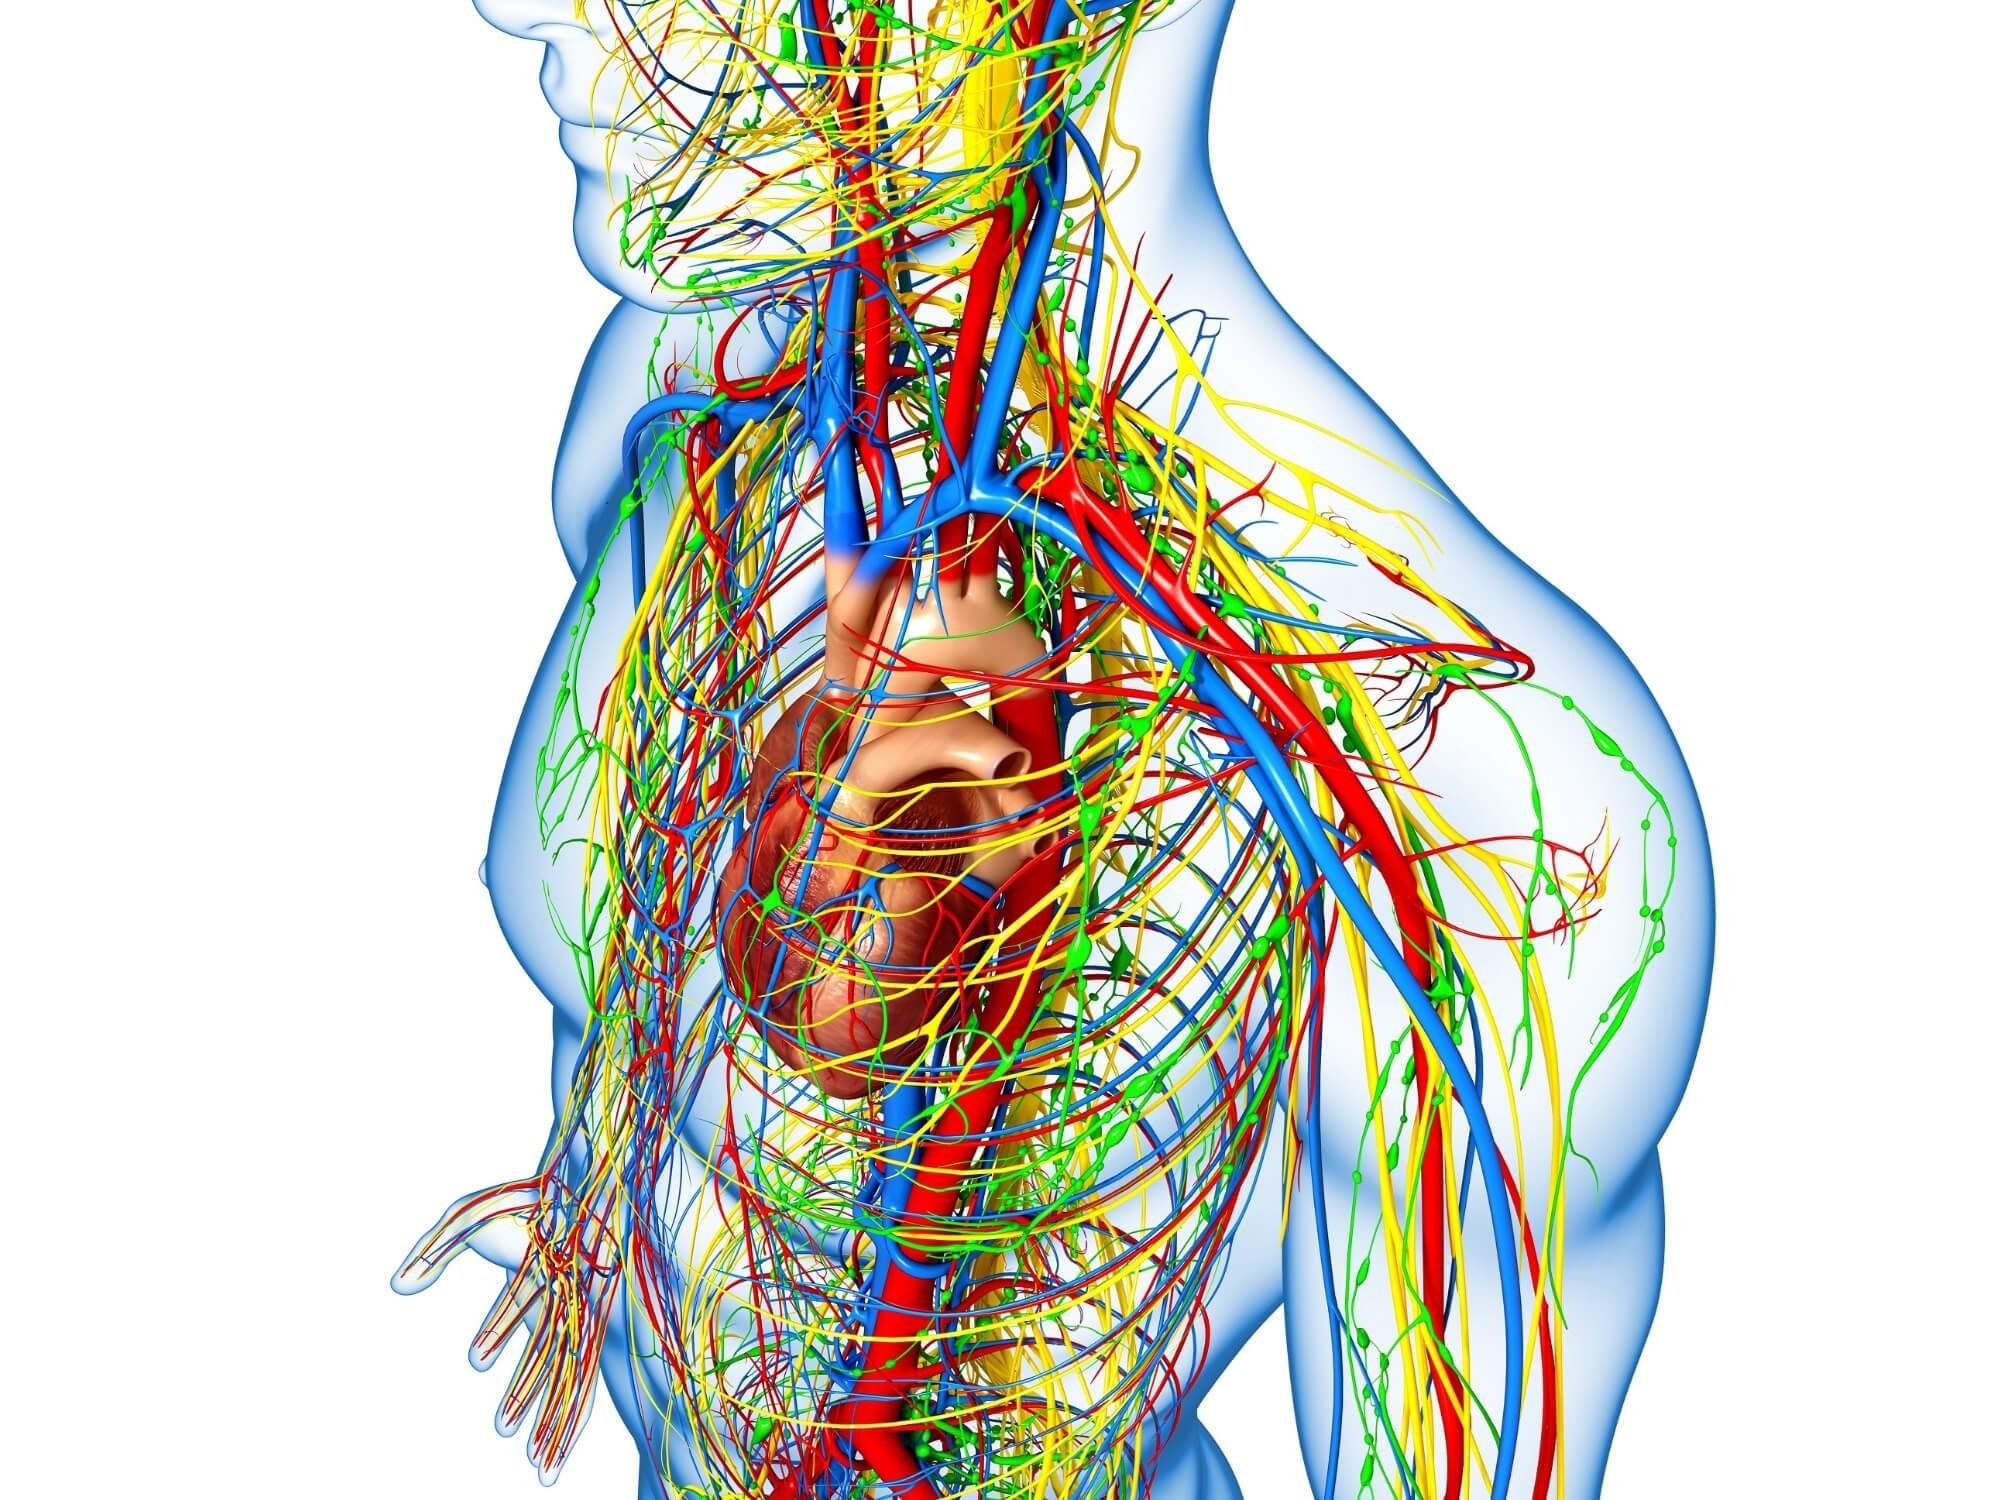 Predicting Progression of Cardiovascular Autonomic Neuropathy in Type 2 Diabetes